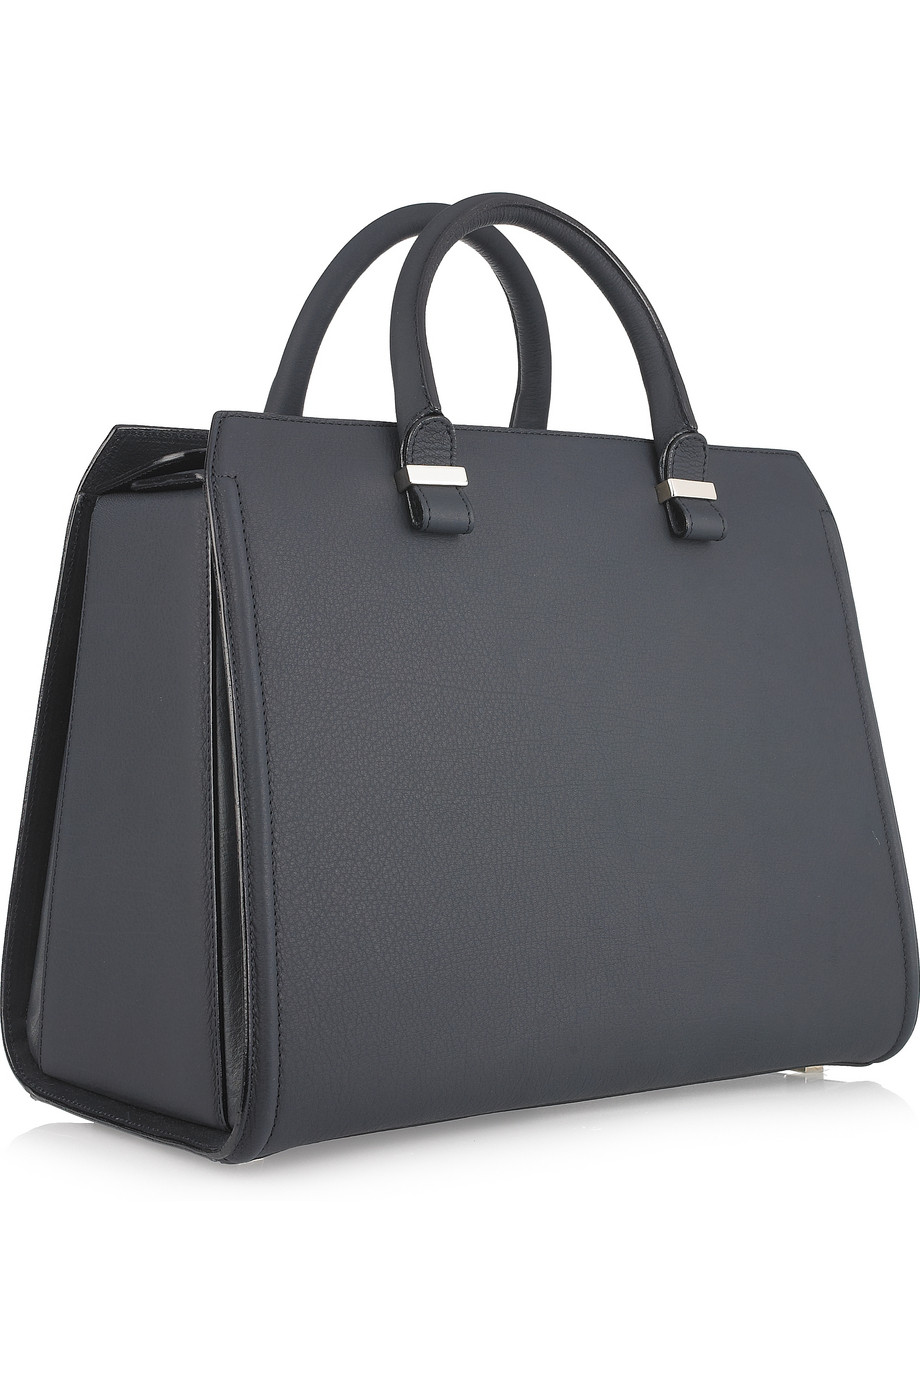 bagfetishperson: Victoria Beckham black structure leather tote